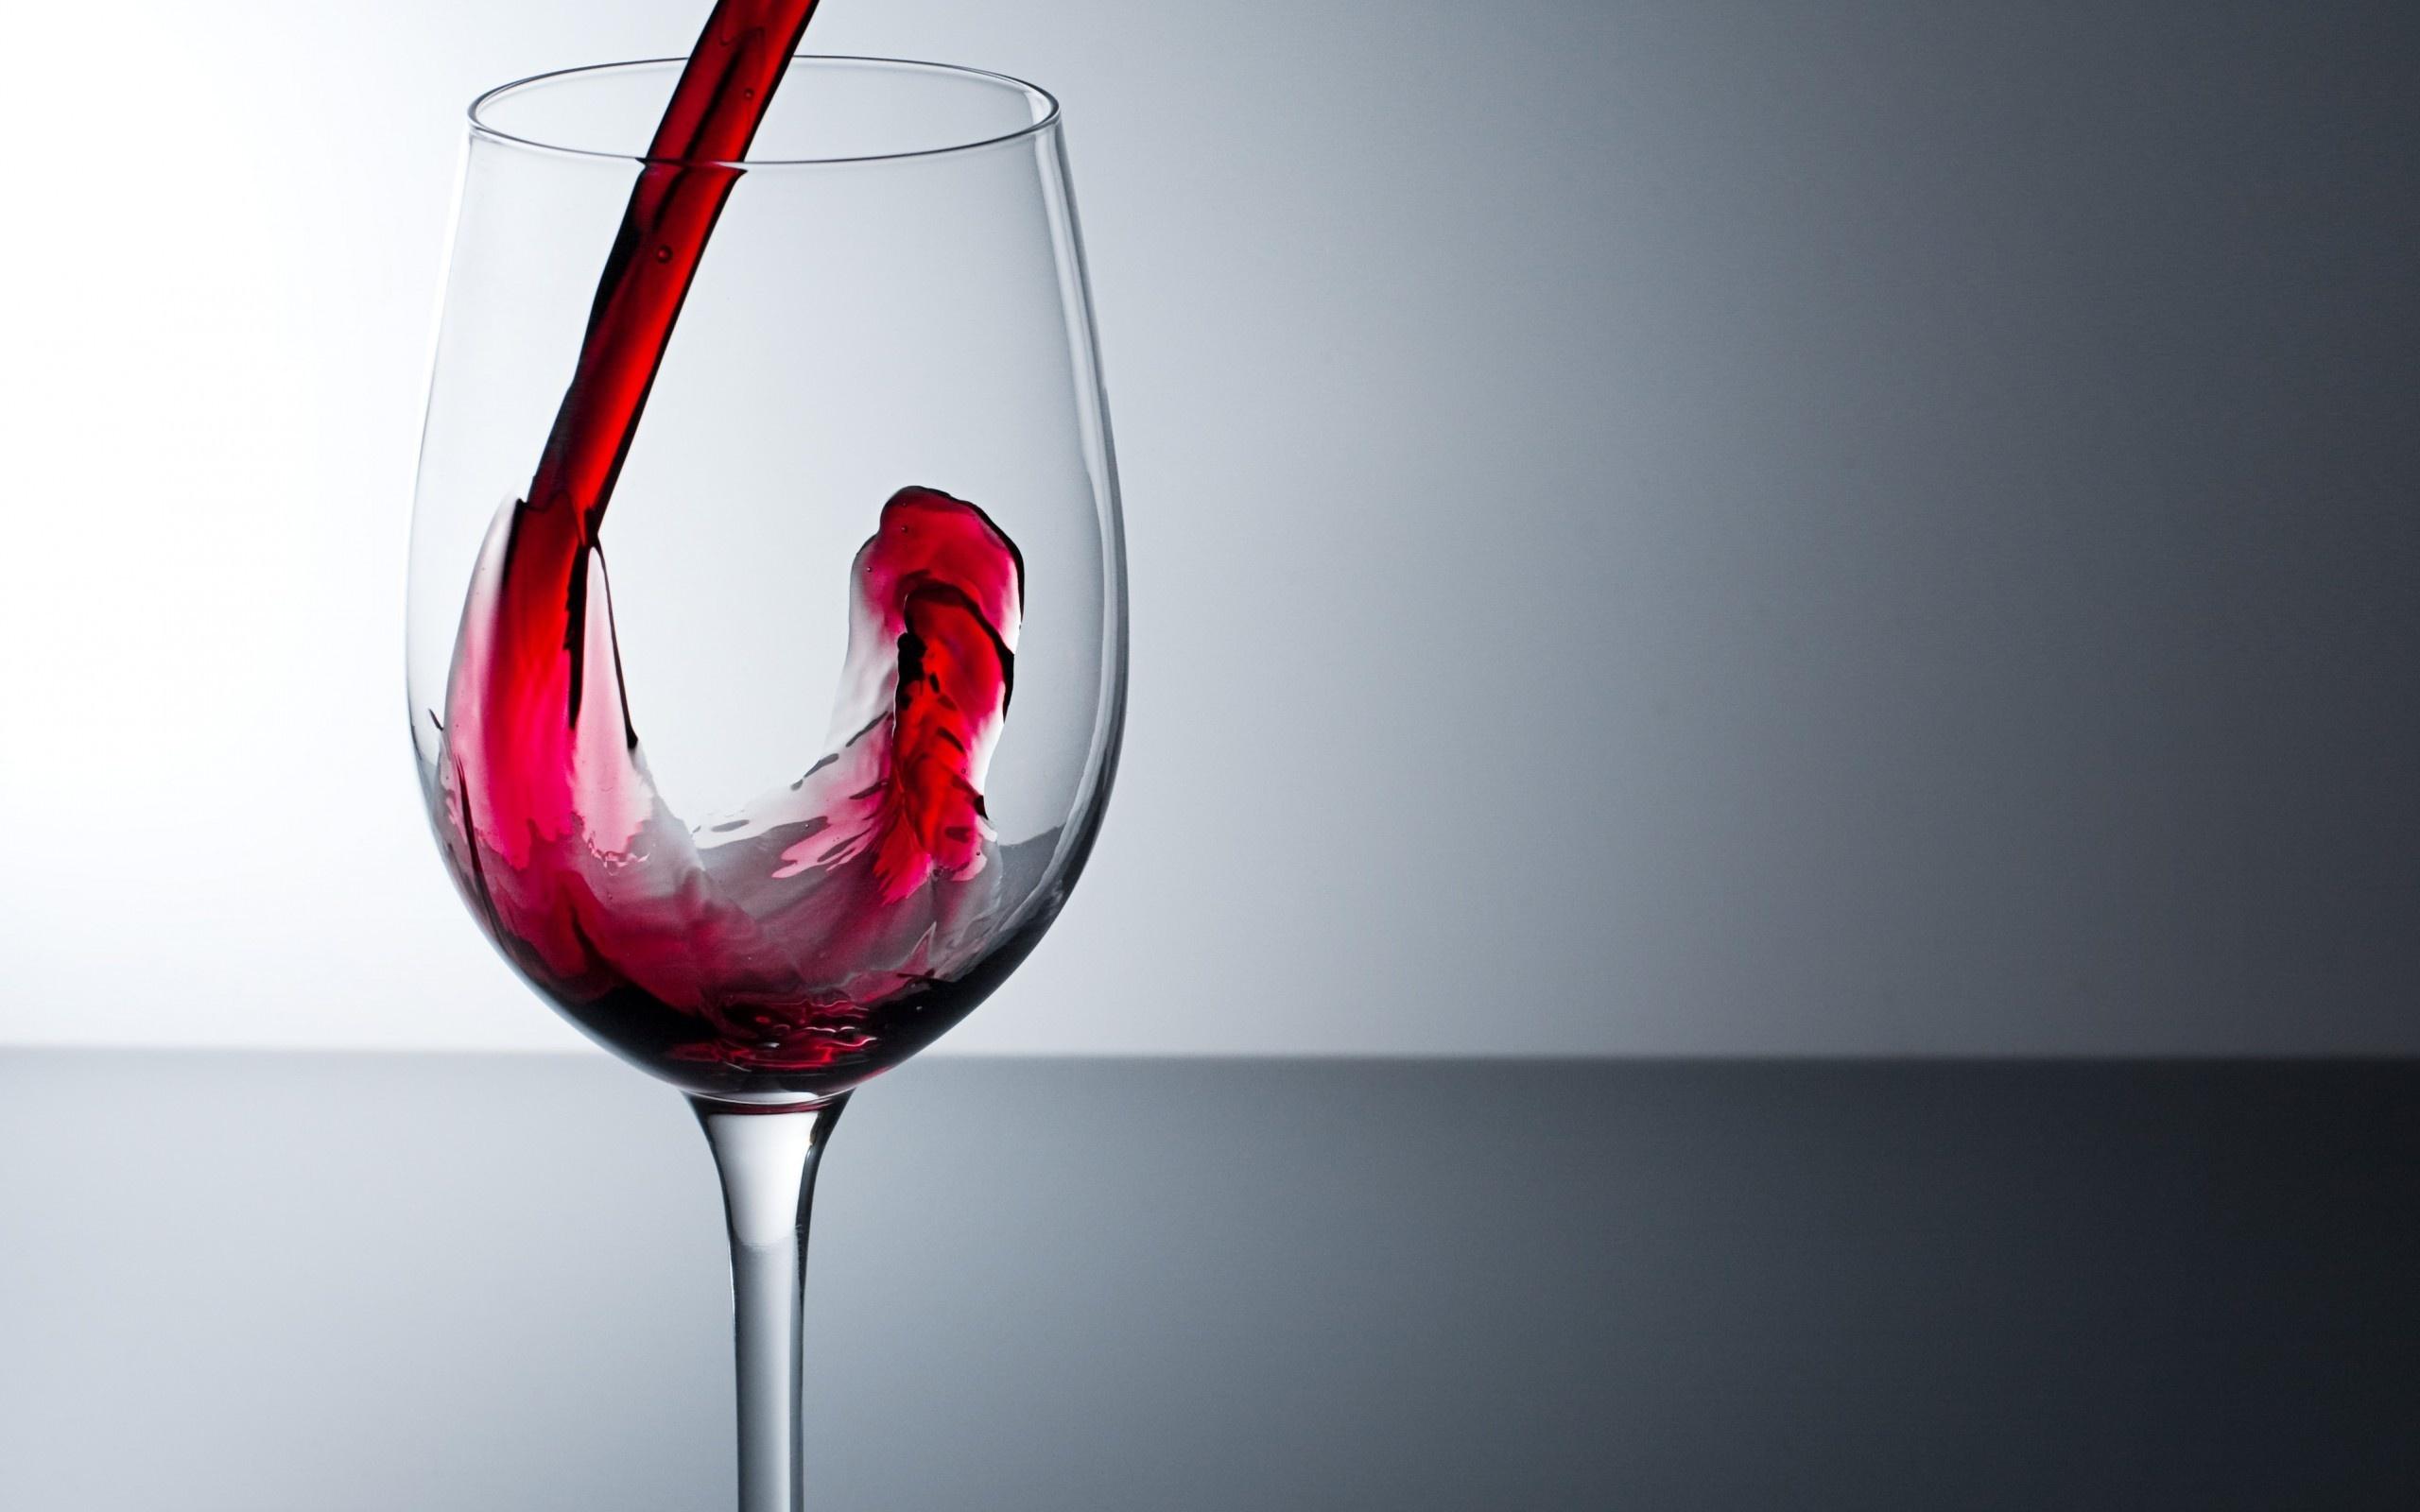 Wallpaper wine glass wineglass desktop wallpaper Other 2560x1600